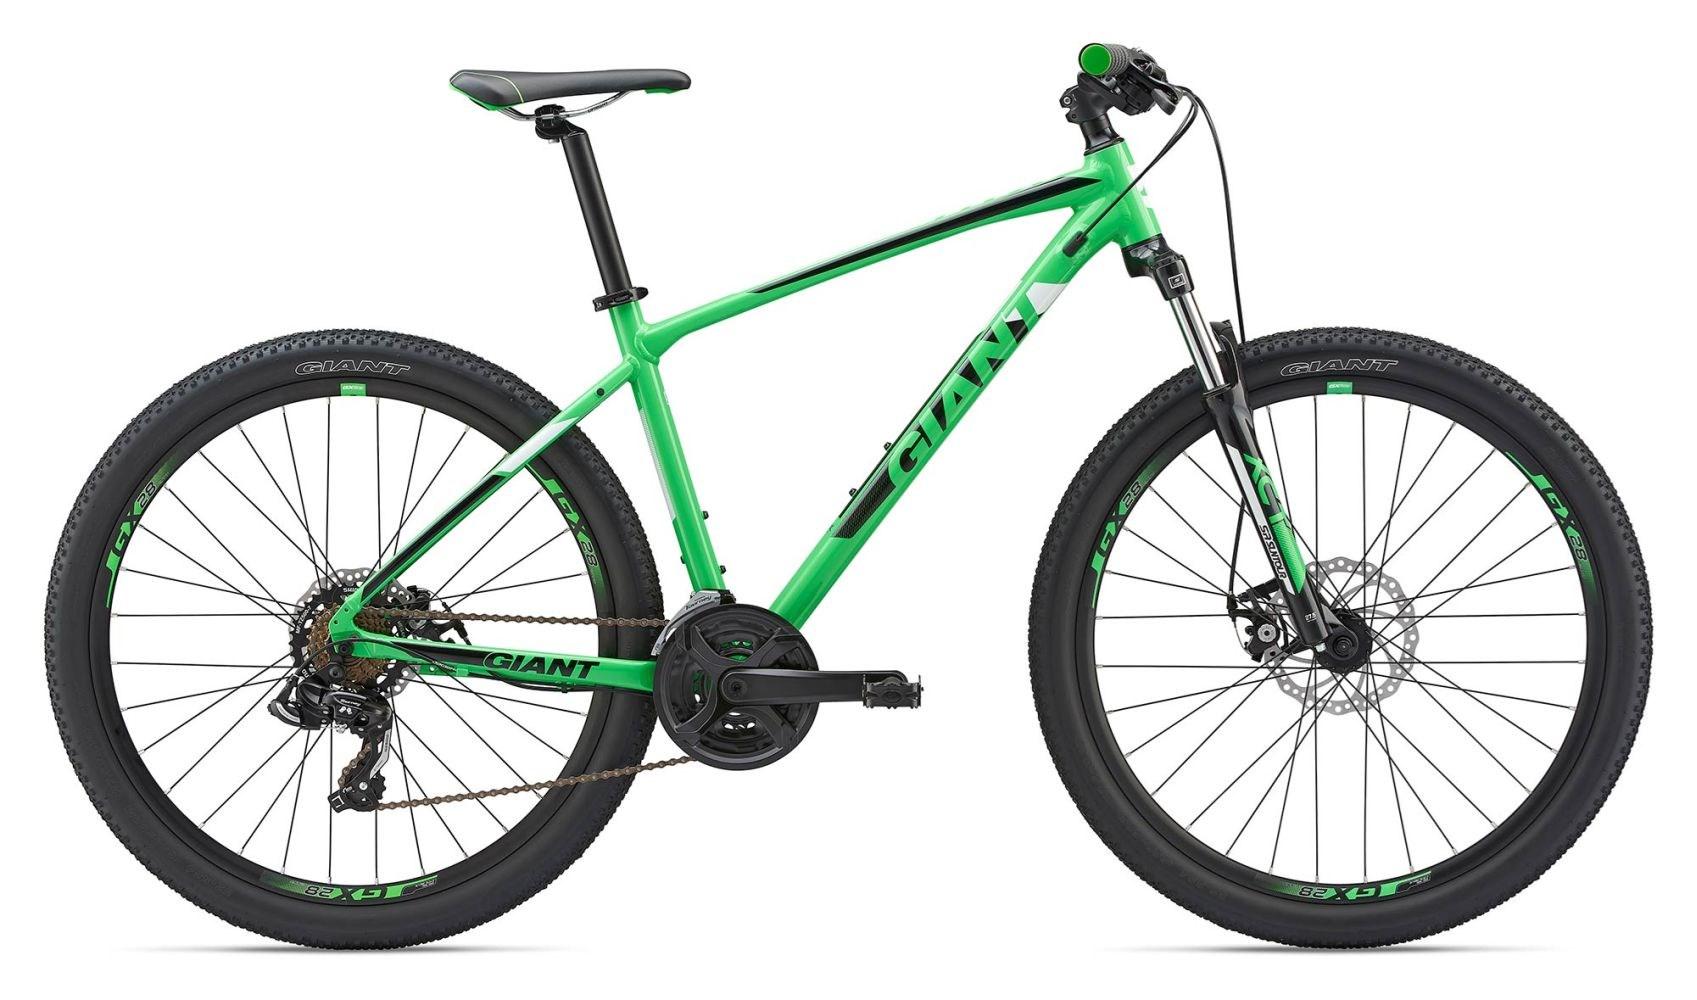 2019 Giant ATX 2 26 Mens Hardtail Mountain Bike in Green